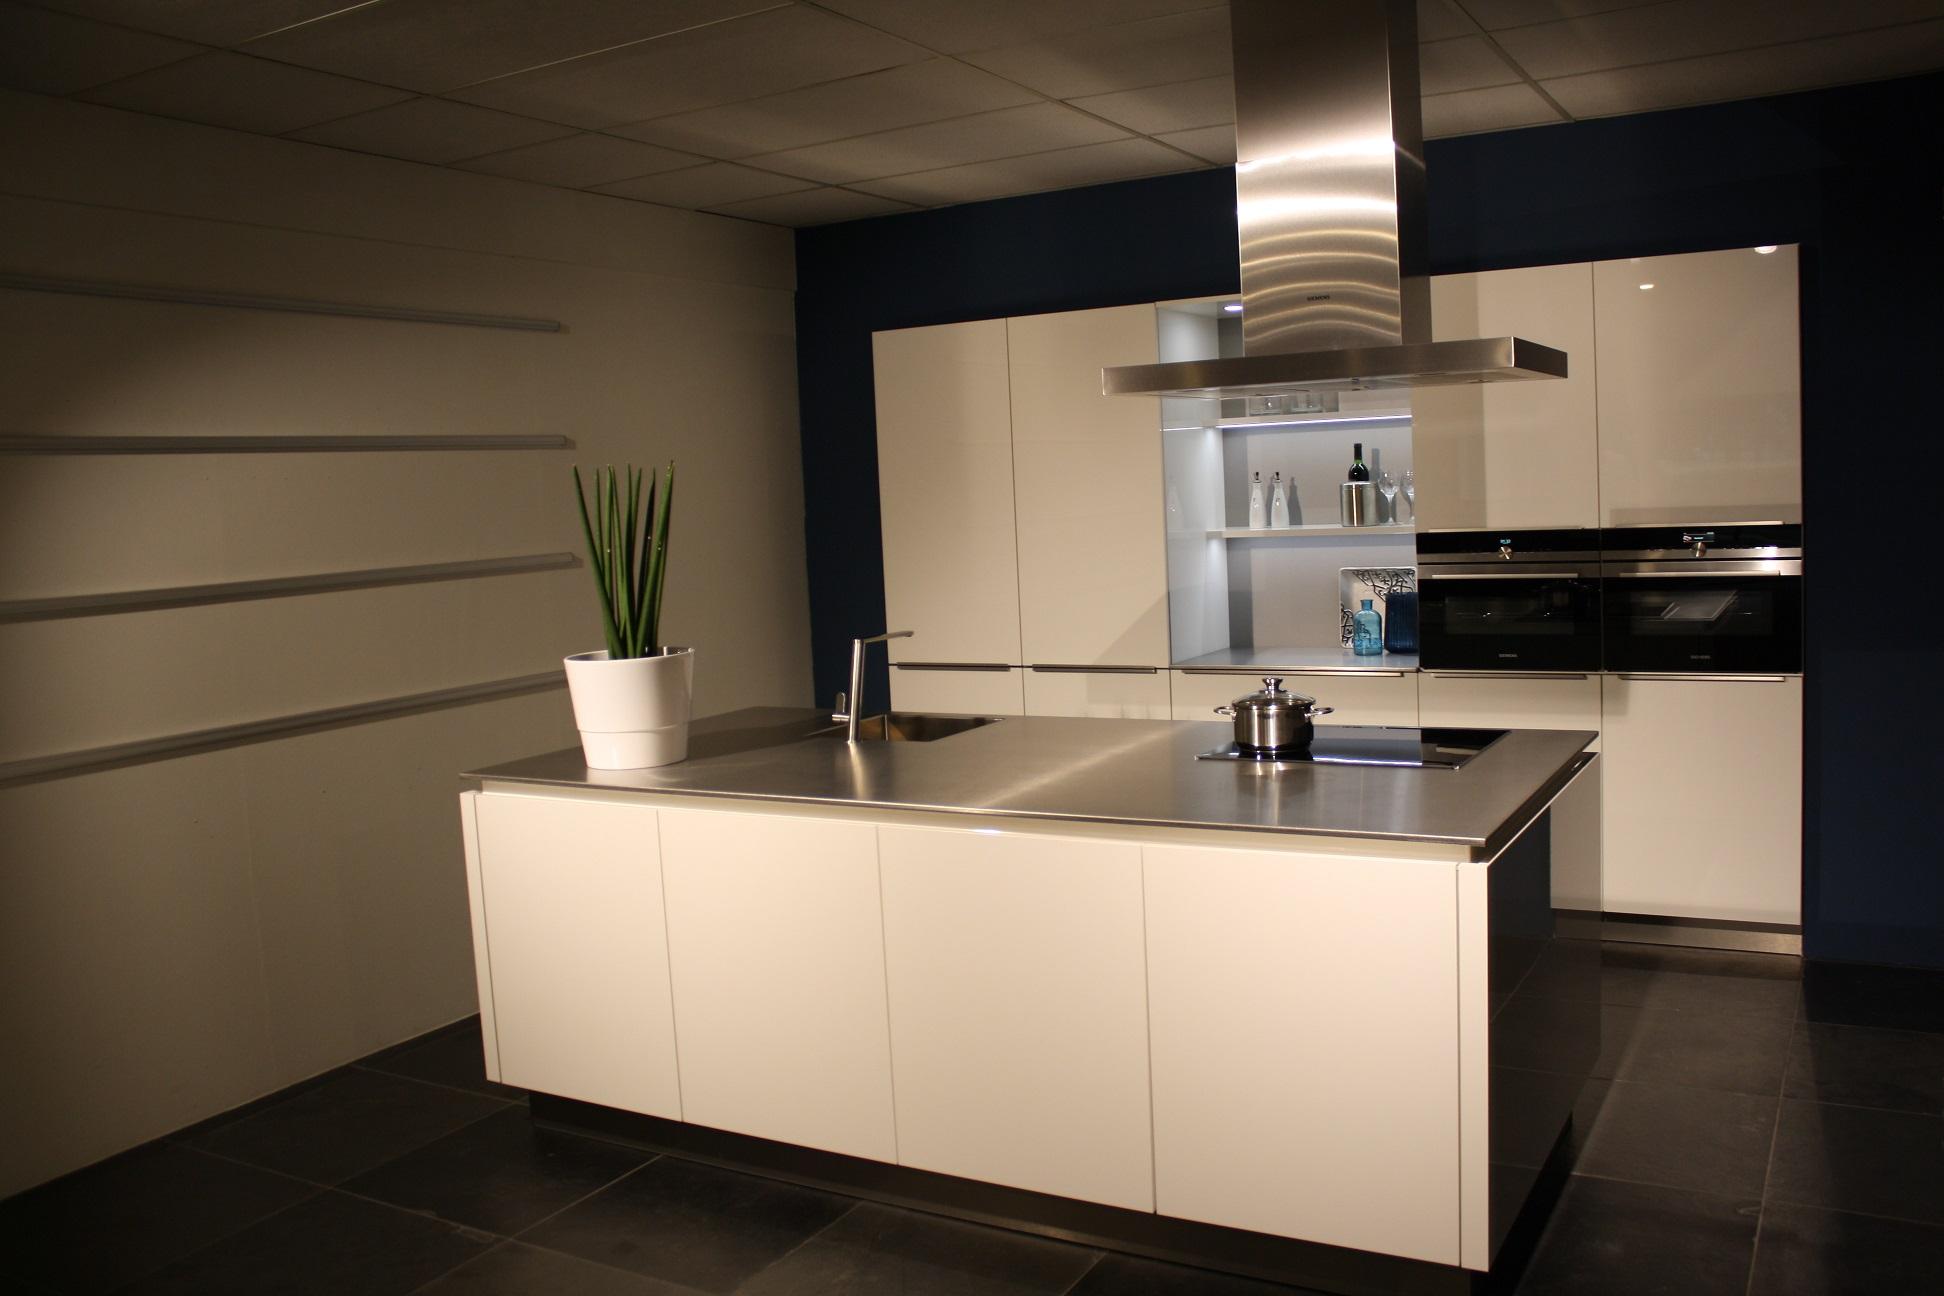 Verwonderend Eiland keuken hoogglans wit - BKB Keukens ZL-22